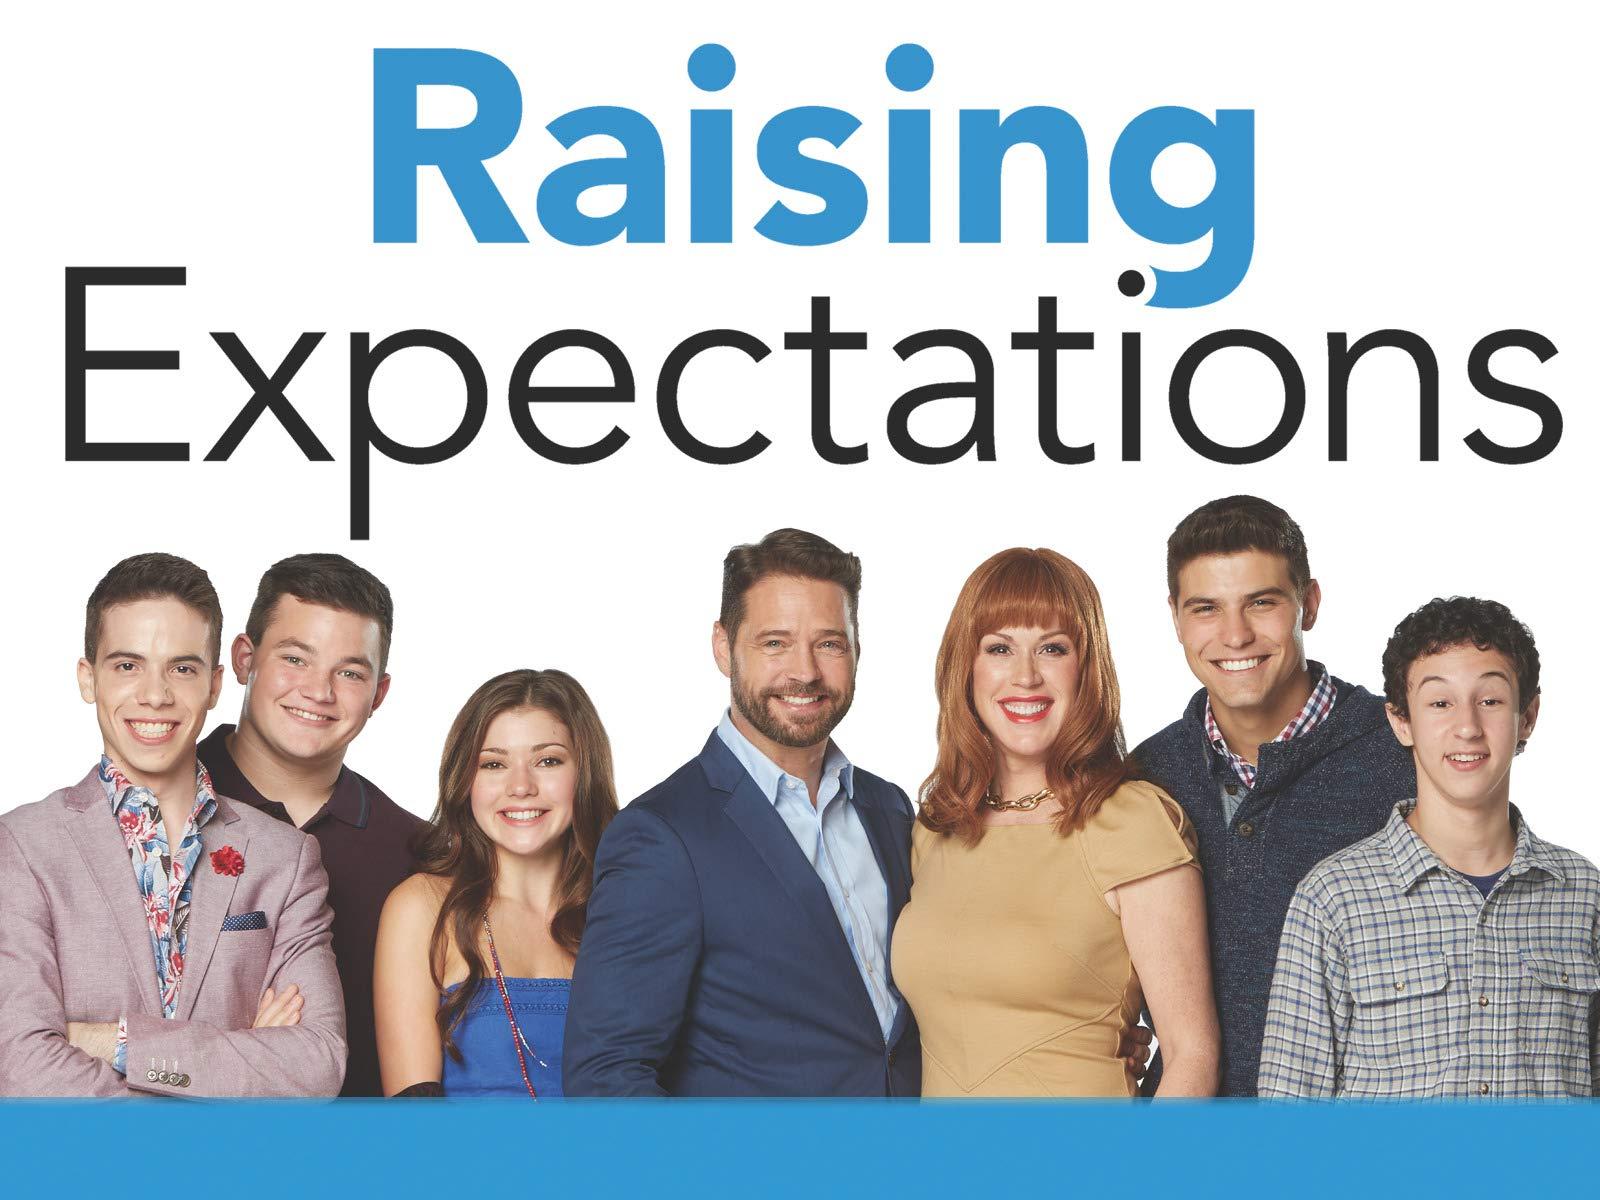 Raising Expectations on Amazon Prime Video UK